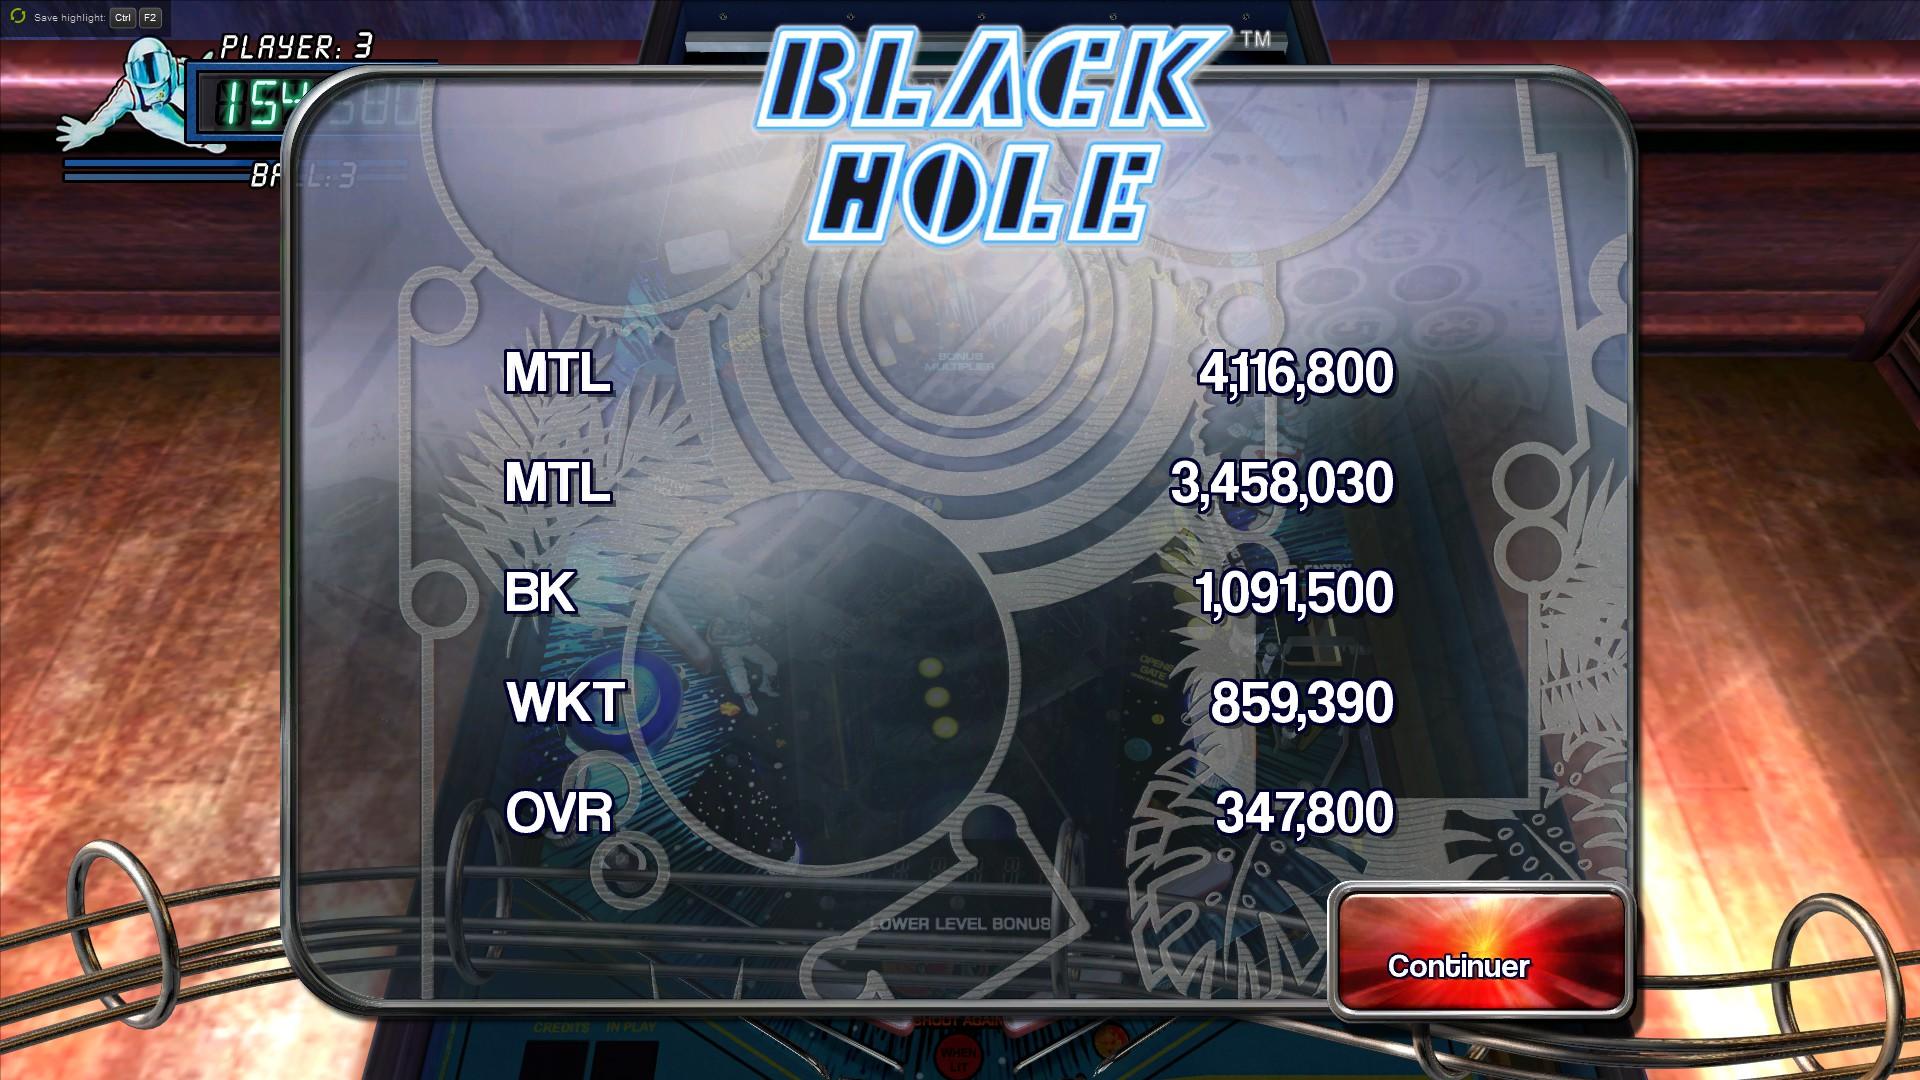 Mantalow: Pinball Arcade: Black Hole (PC) 4,116,800 points on 2015-08-27 10:48:27